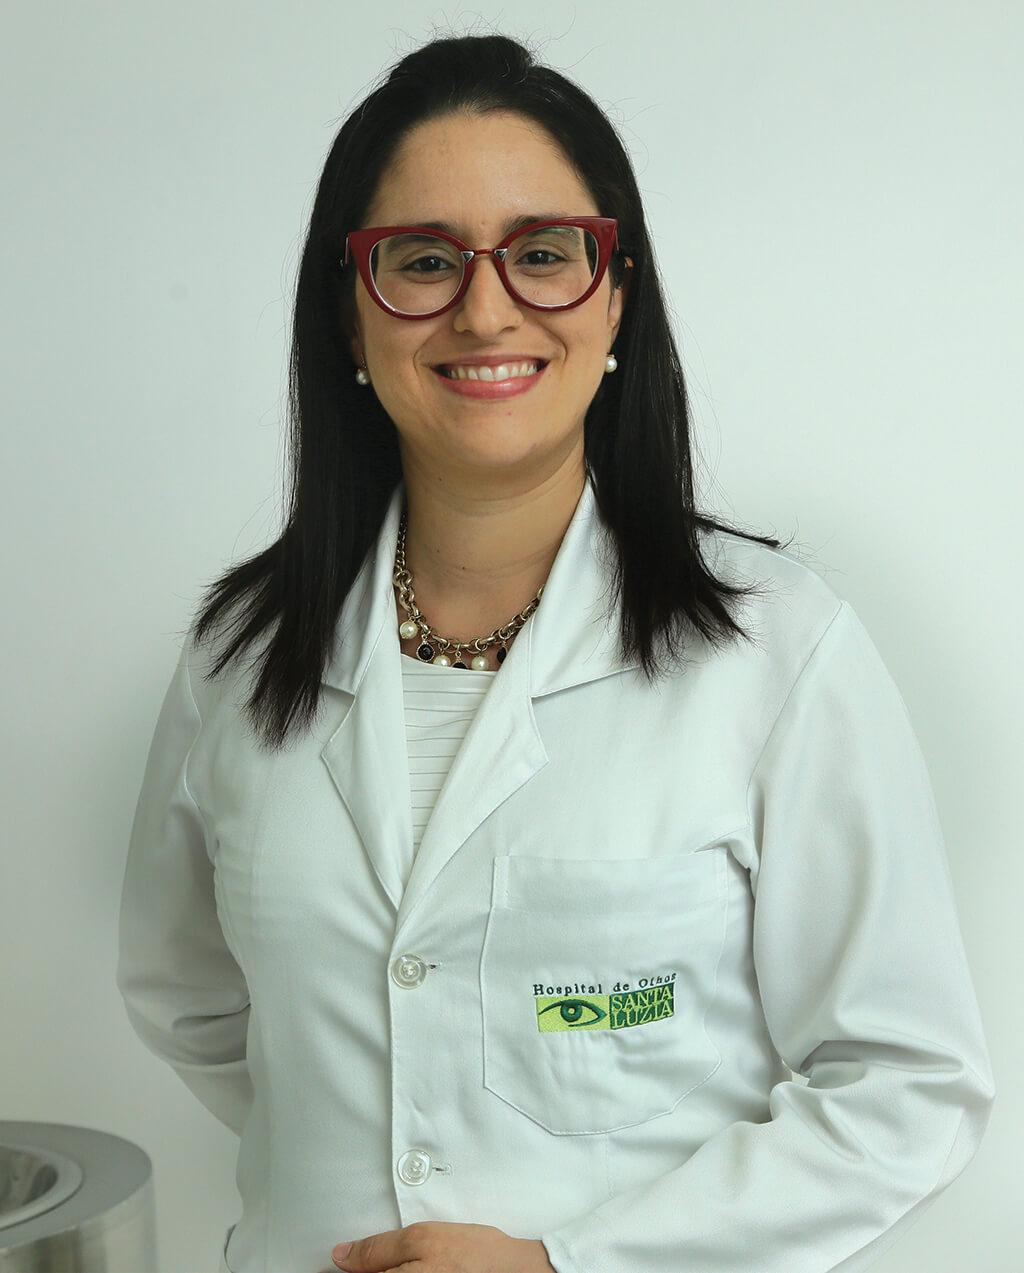 Hayana Rangel